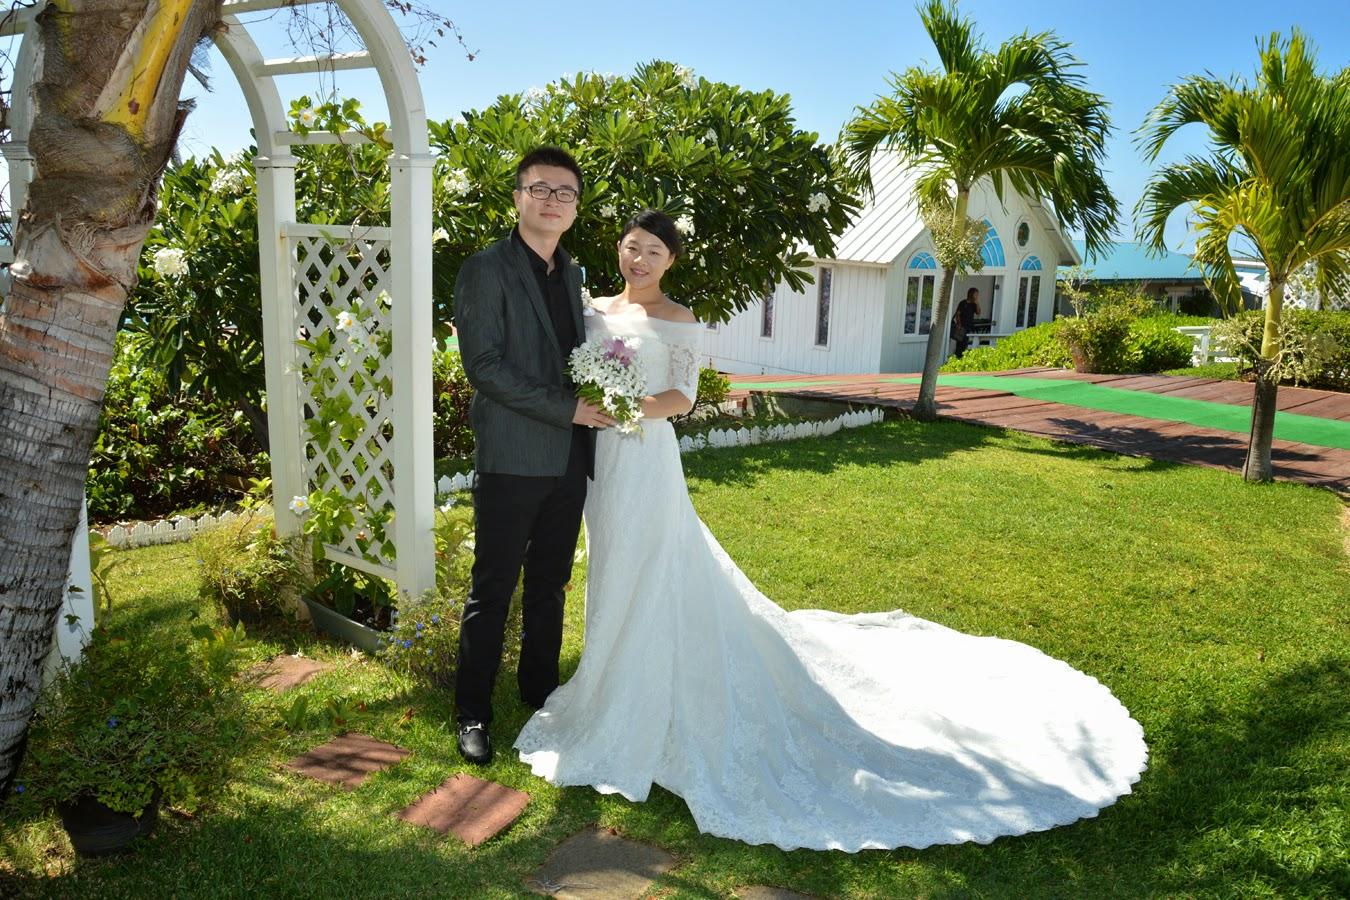 Hawaii Wedding Chapel: Couple from China